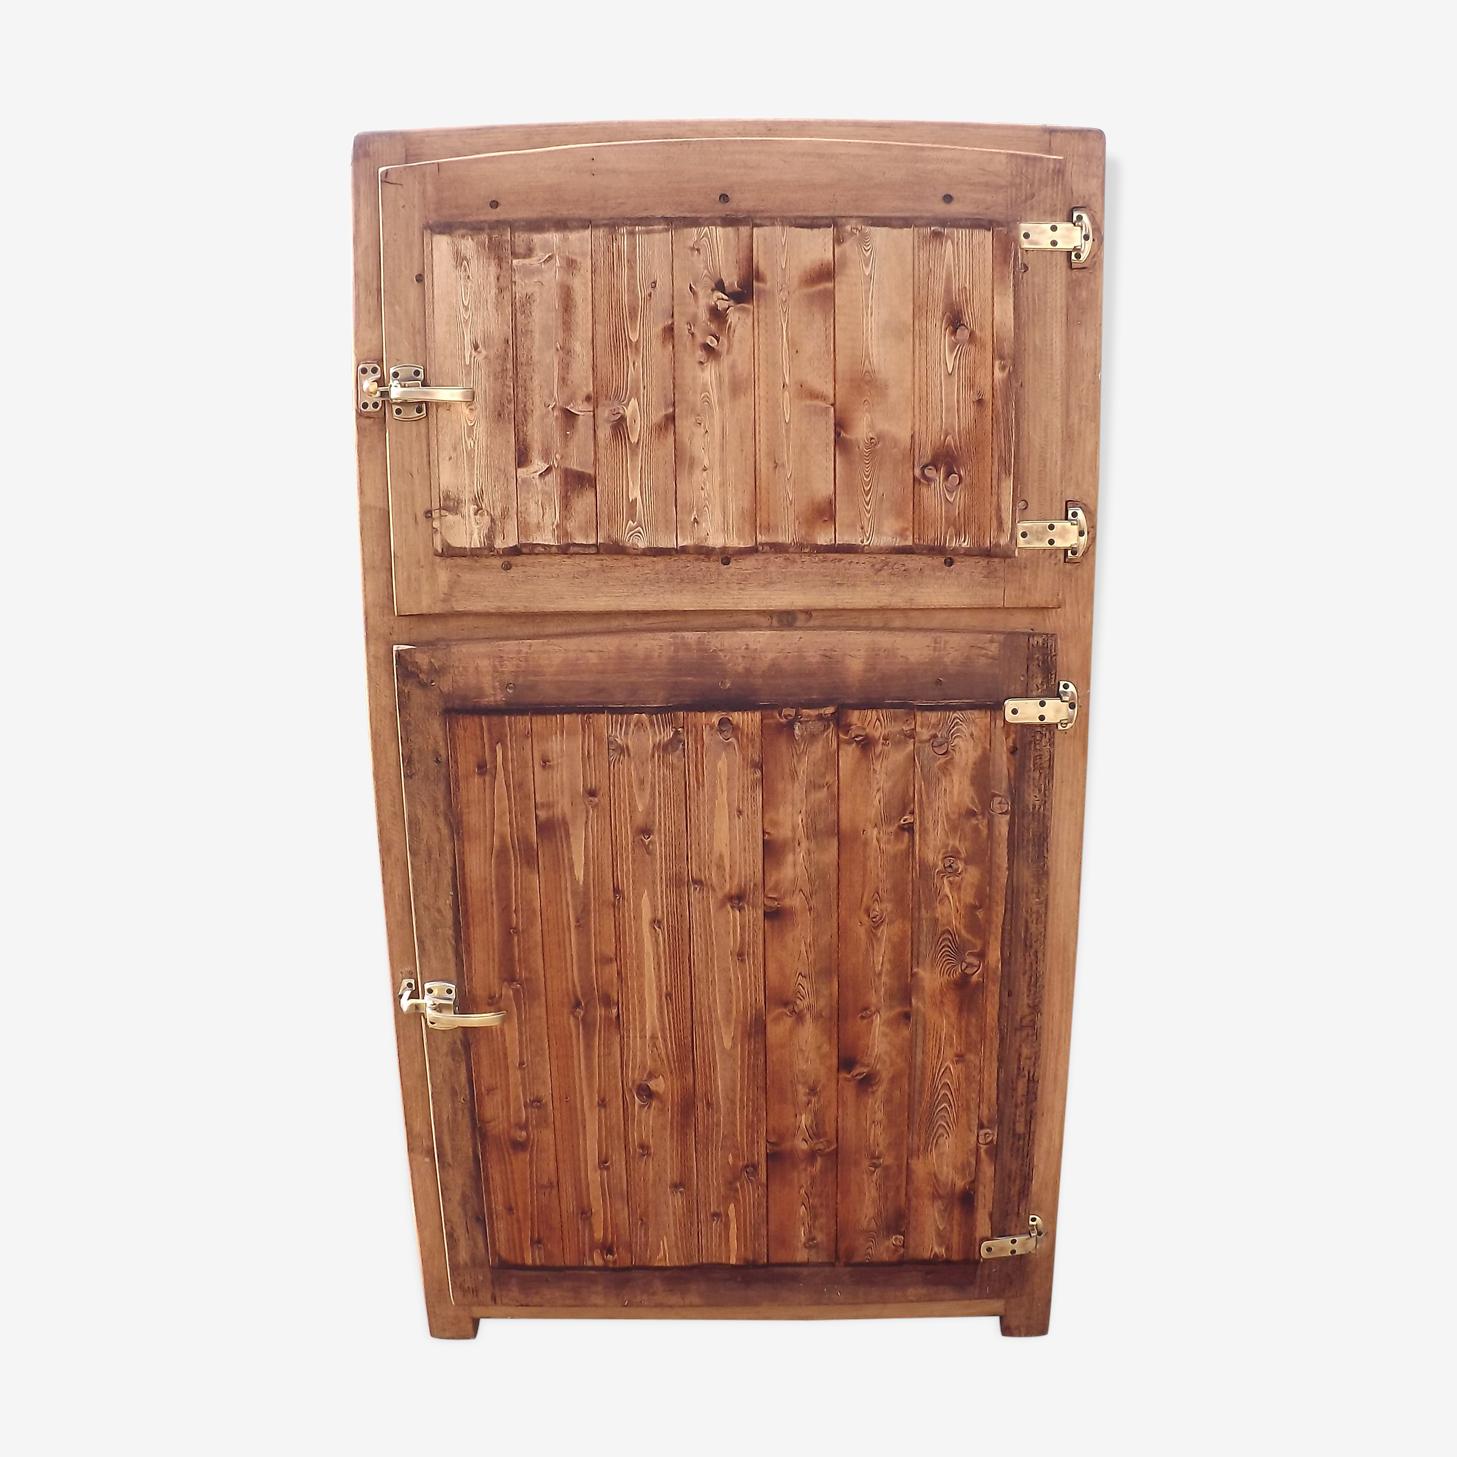 Buffet ancien frigo bois 2 portes